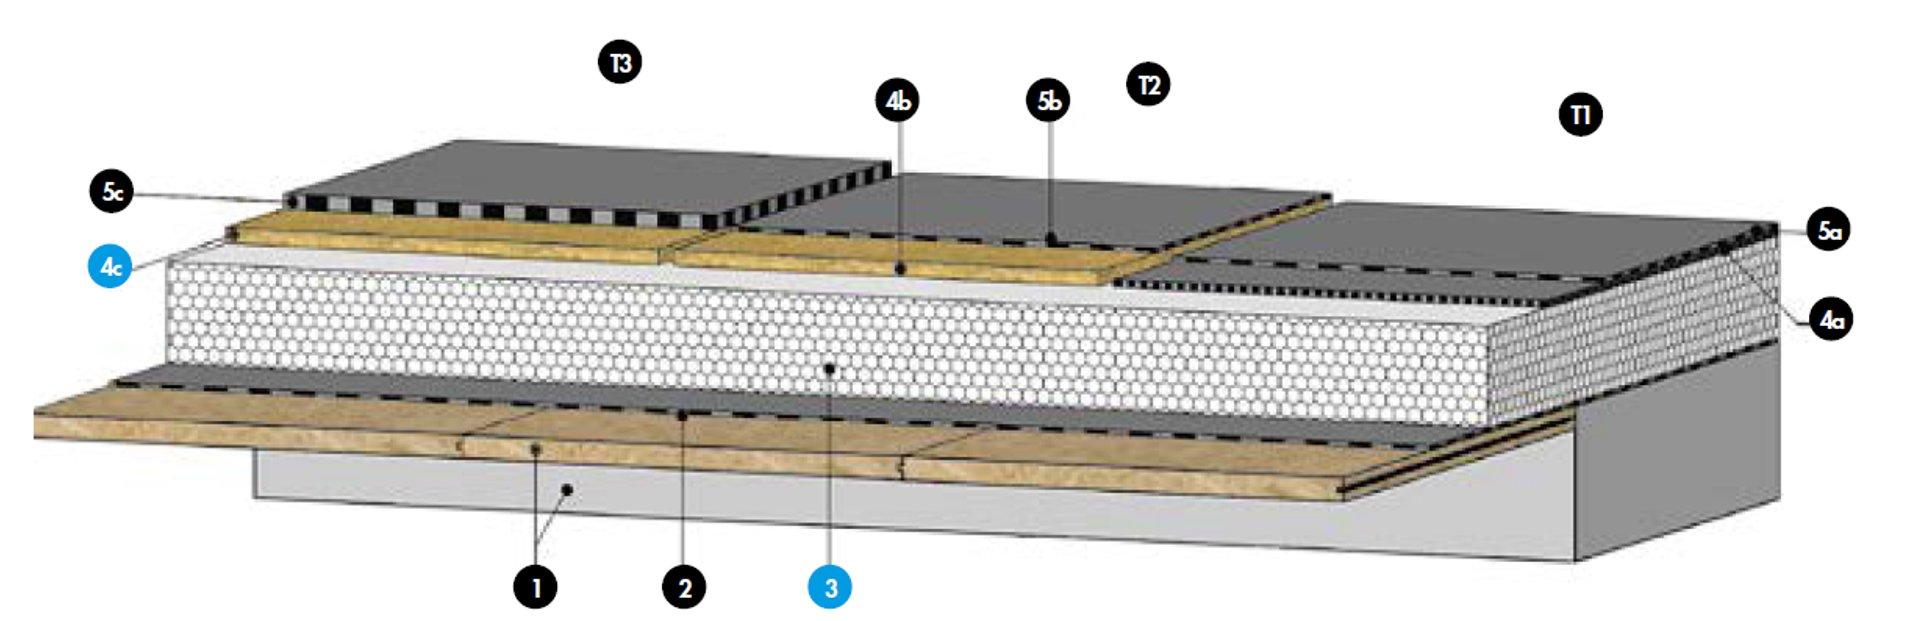 Knauf Therm TTI Th36 SE schéma